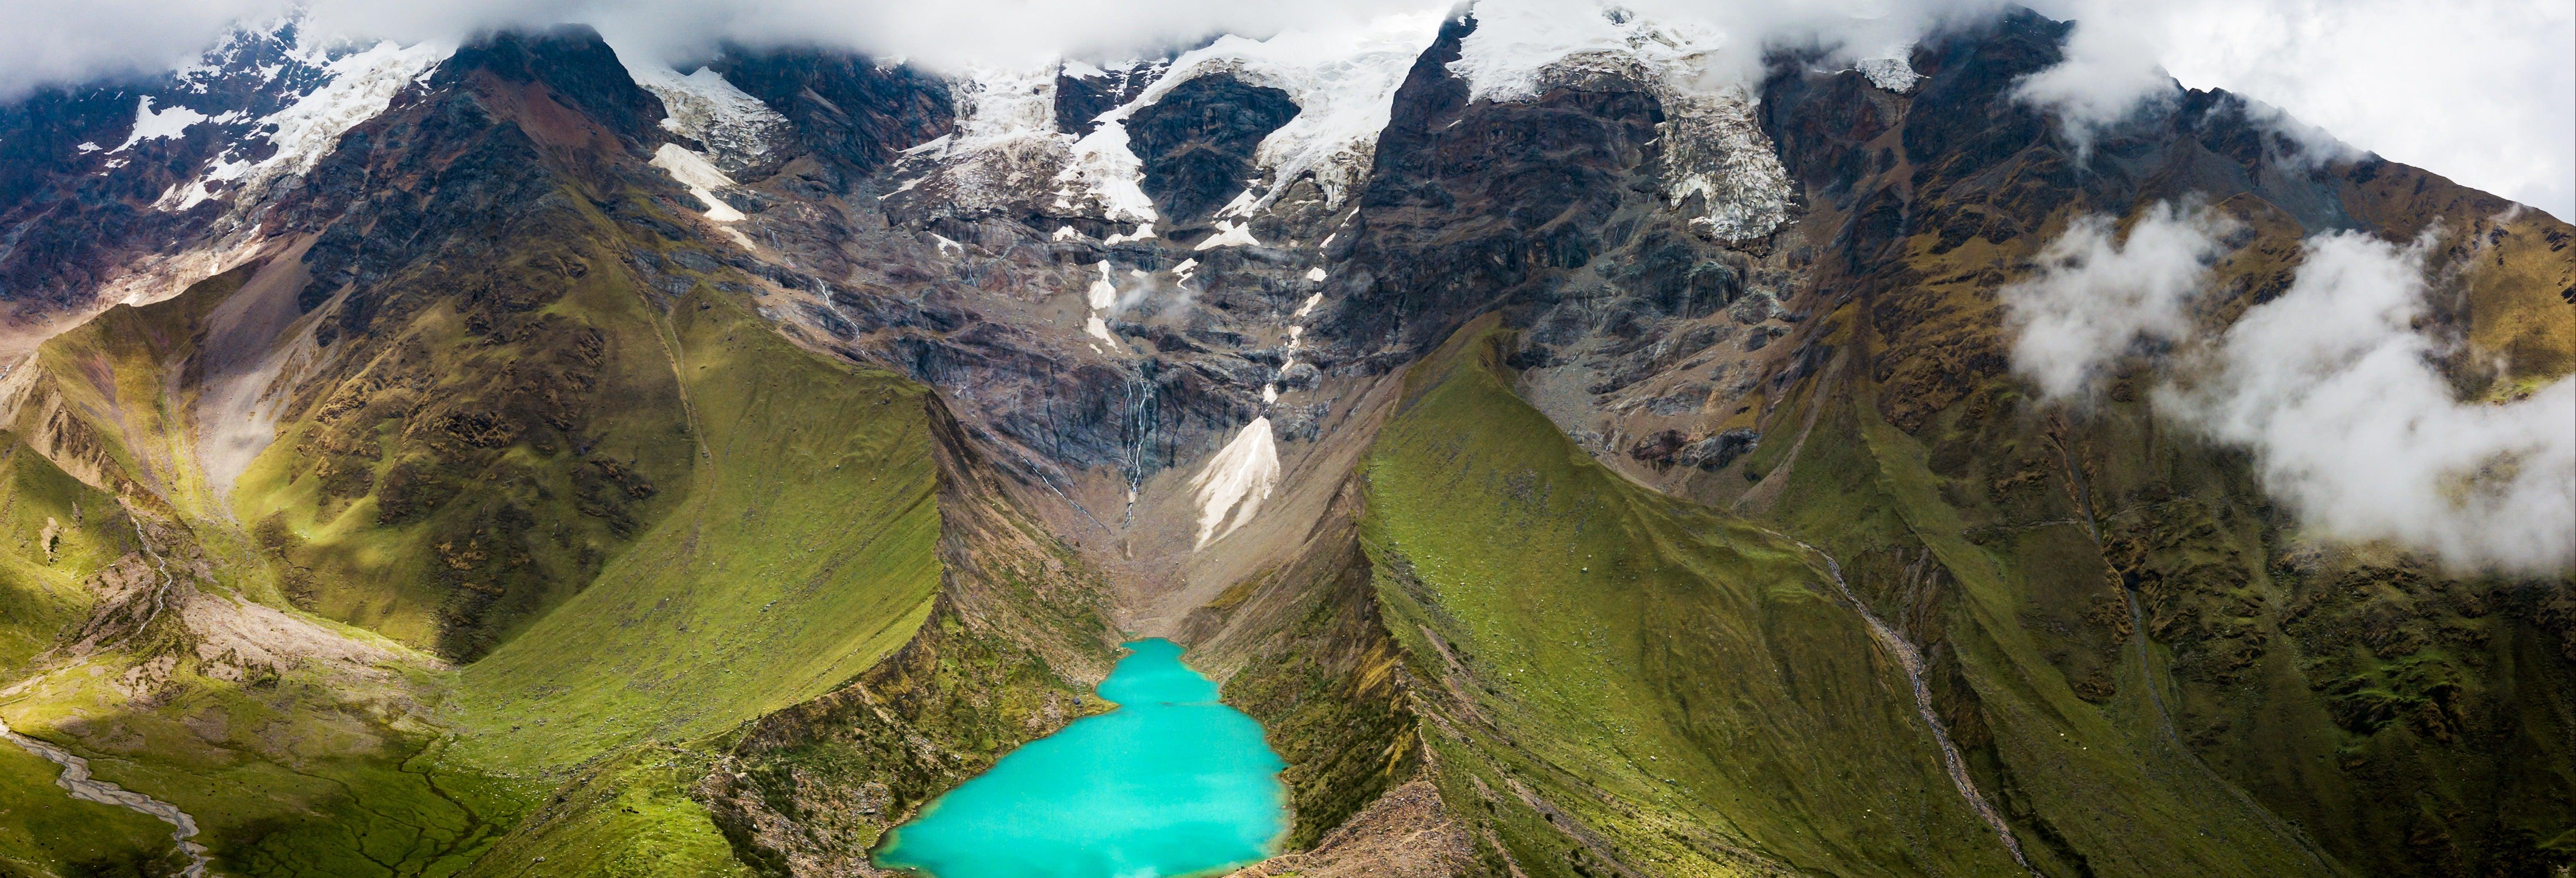 Cusco, Laguna Humantay y Machu Picchu en 4 días